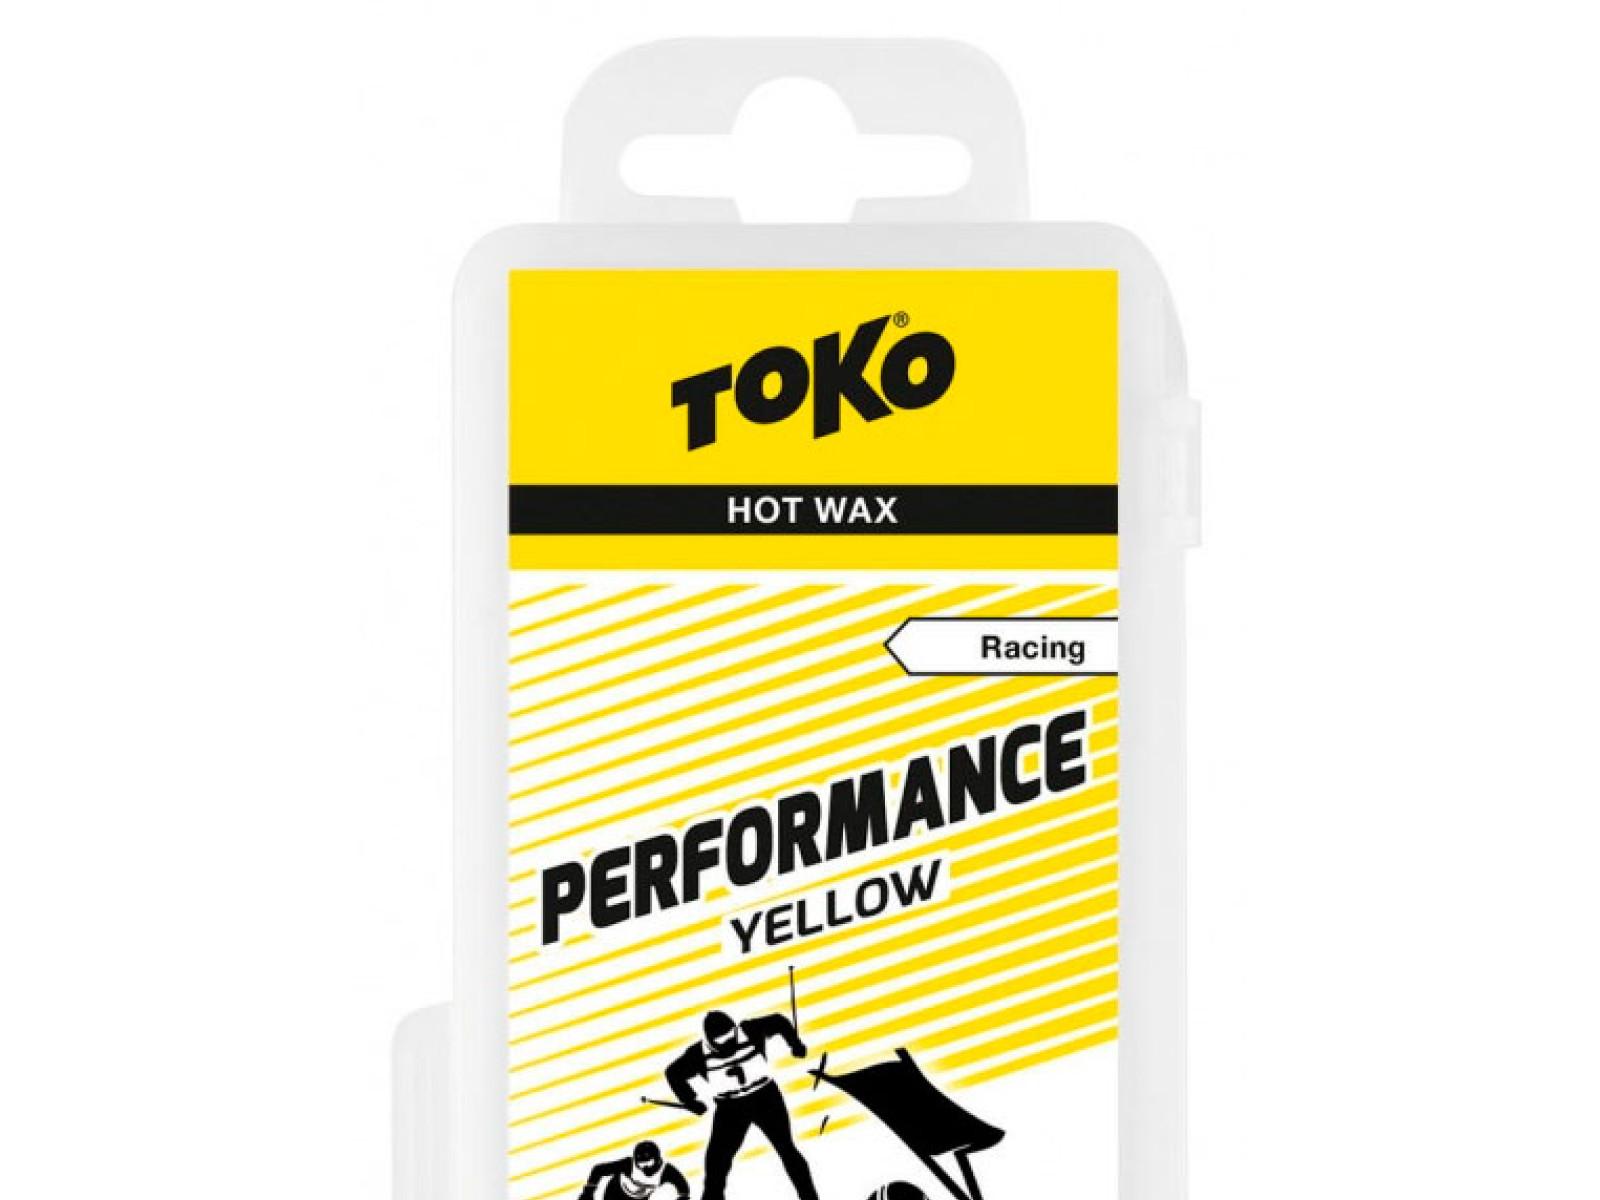 TOKO Performance Yellow 120g, žlutý parafín (LF) 2019/2020